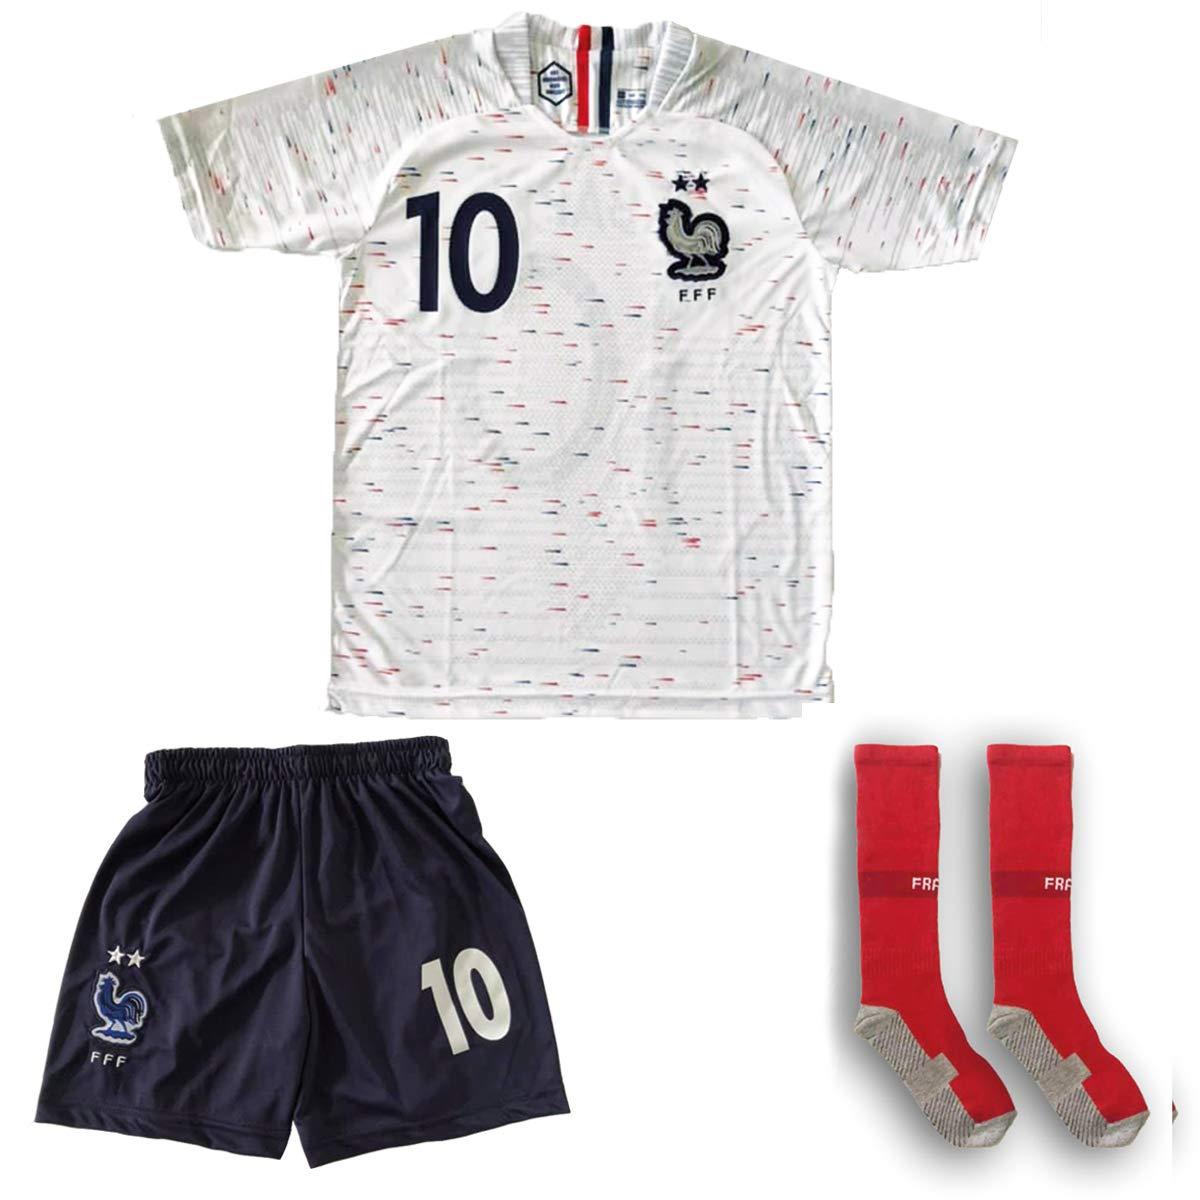 the best attitude 90450 9b449 France Mbappe Jersey #10 Away 18/19 - Football Kits Soccer Shirt For Kids  Boys Children Youth